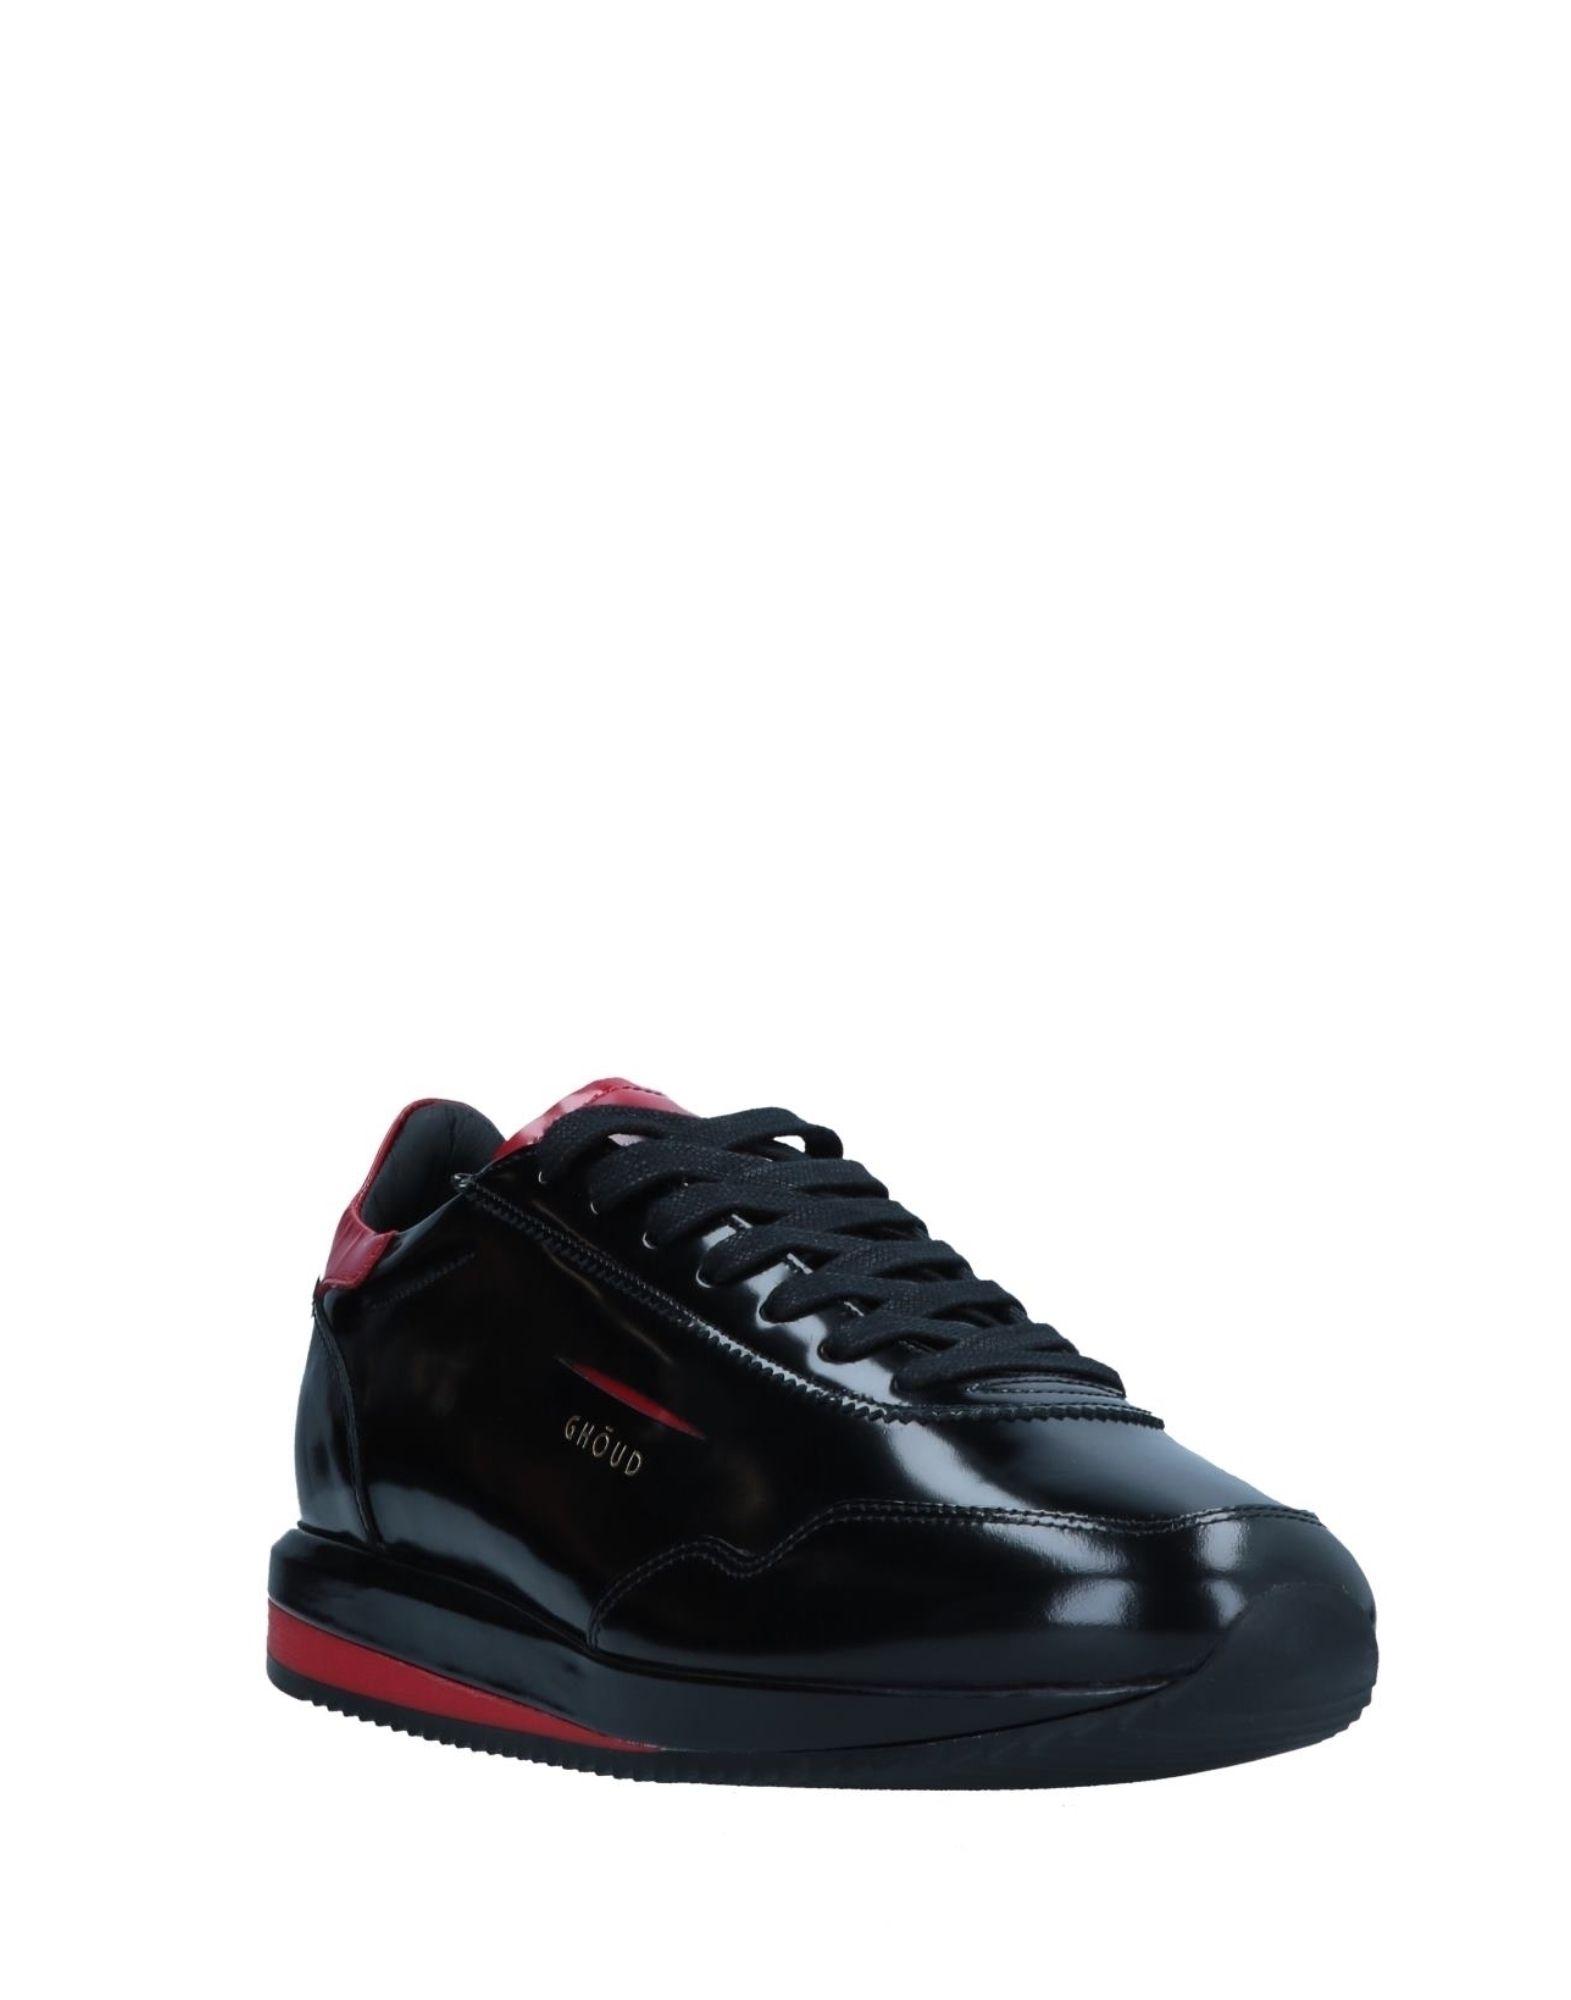 Sneakers - Ghōud Venice Uomo - Sneakers 11545419NQ fd5ad6